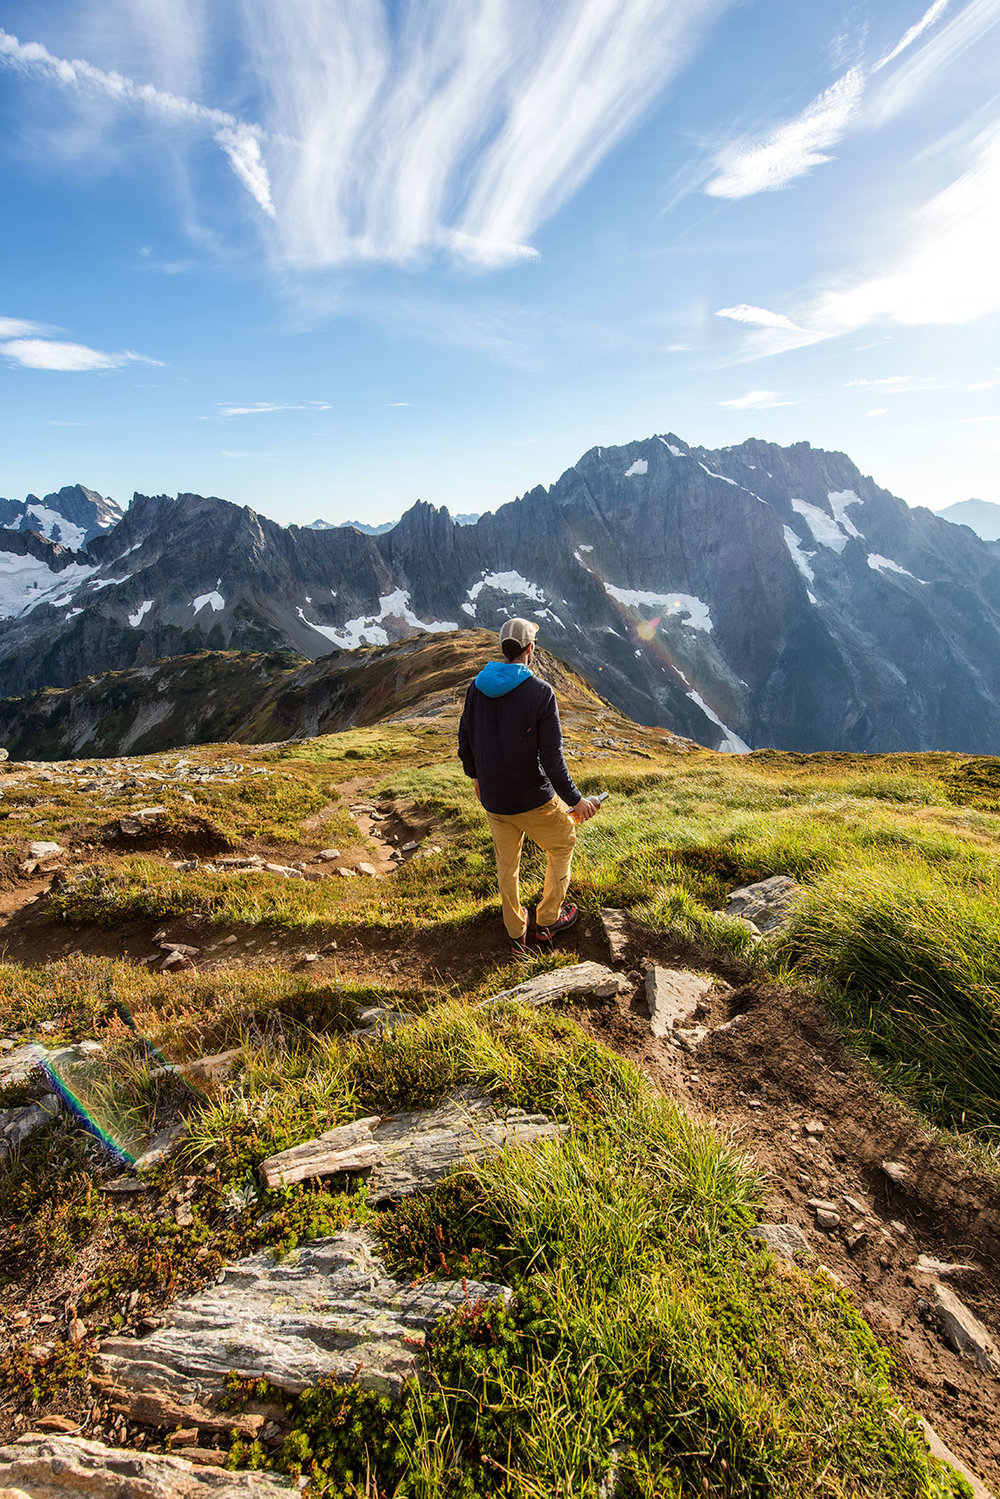 austin-trigg-whiskey-lifestyle-washington-sahale-arm-north-cascades-hiking-lifestyle.jpg